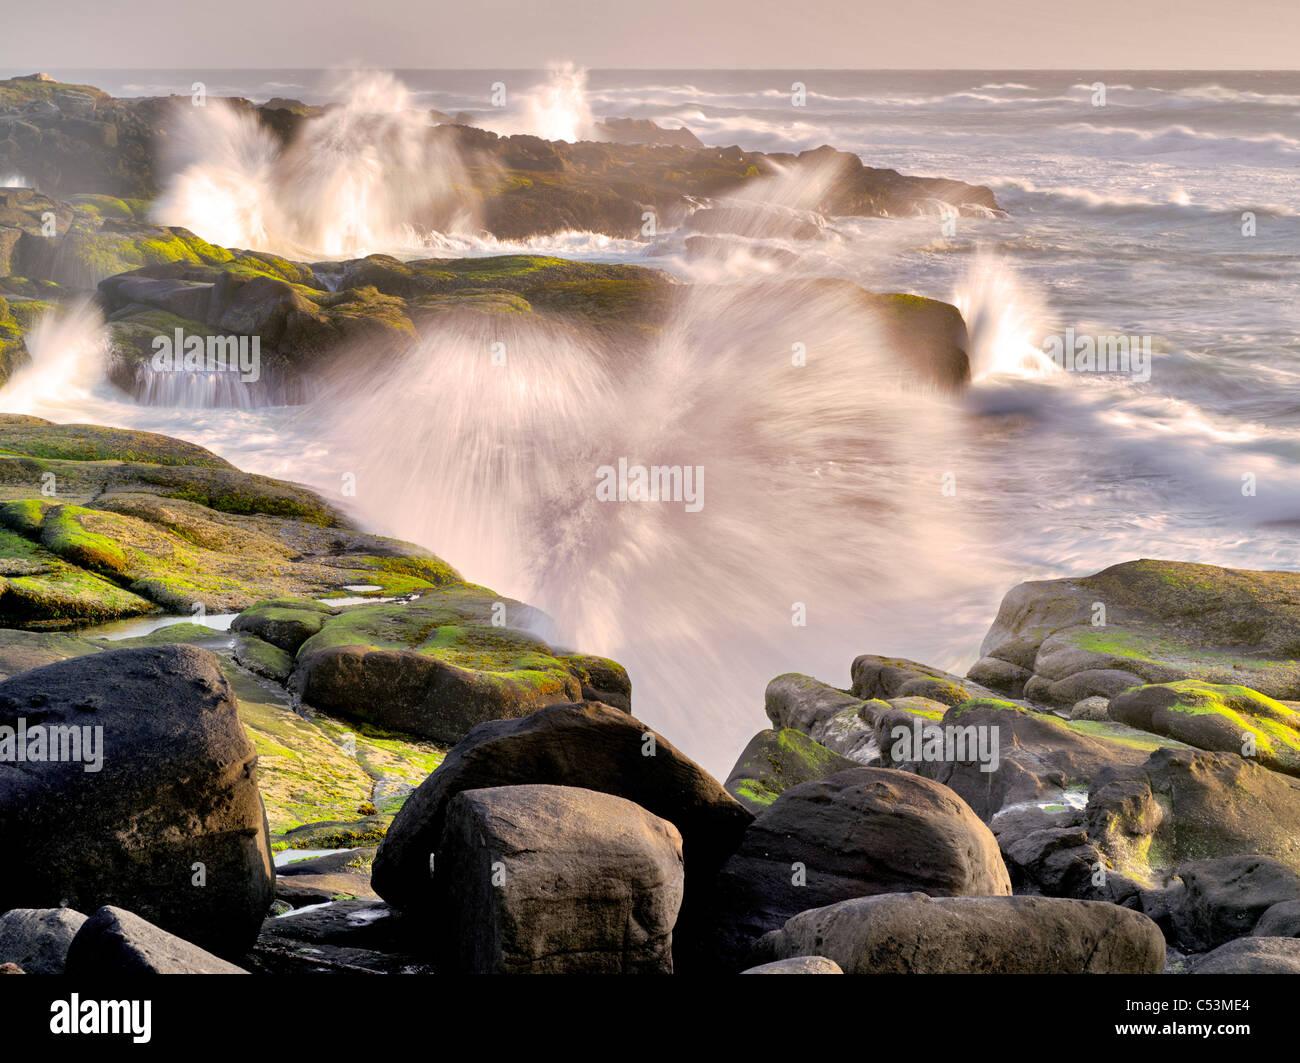 Storm waves crashing on shore. Smelt Sands State Park, Oregon - Stock Image